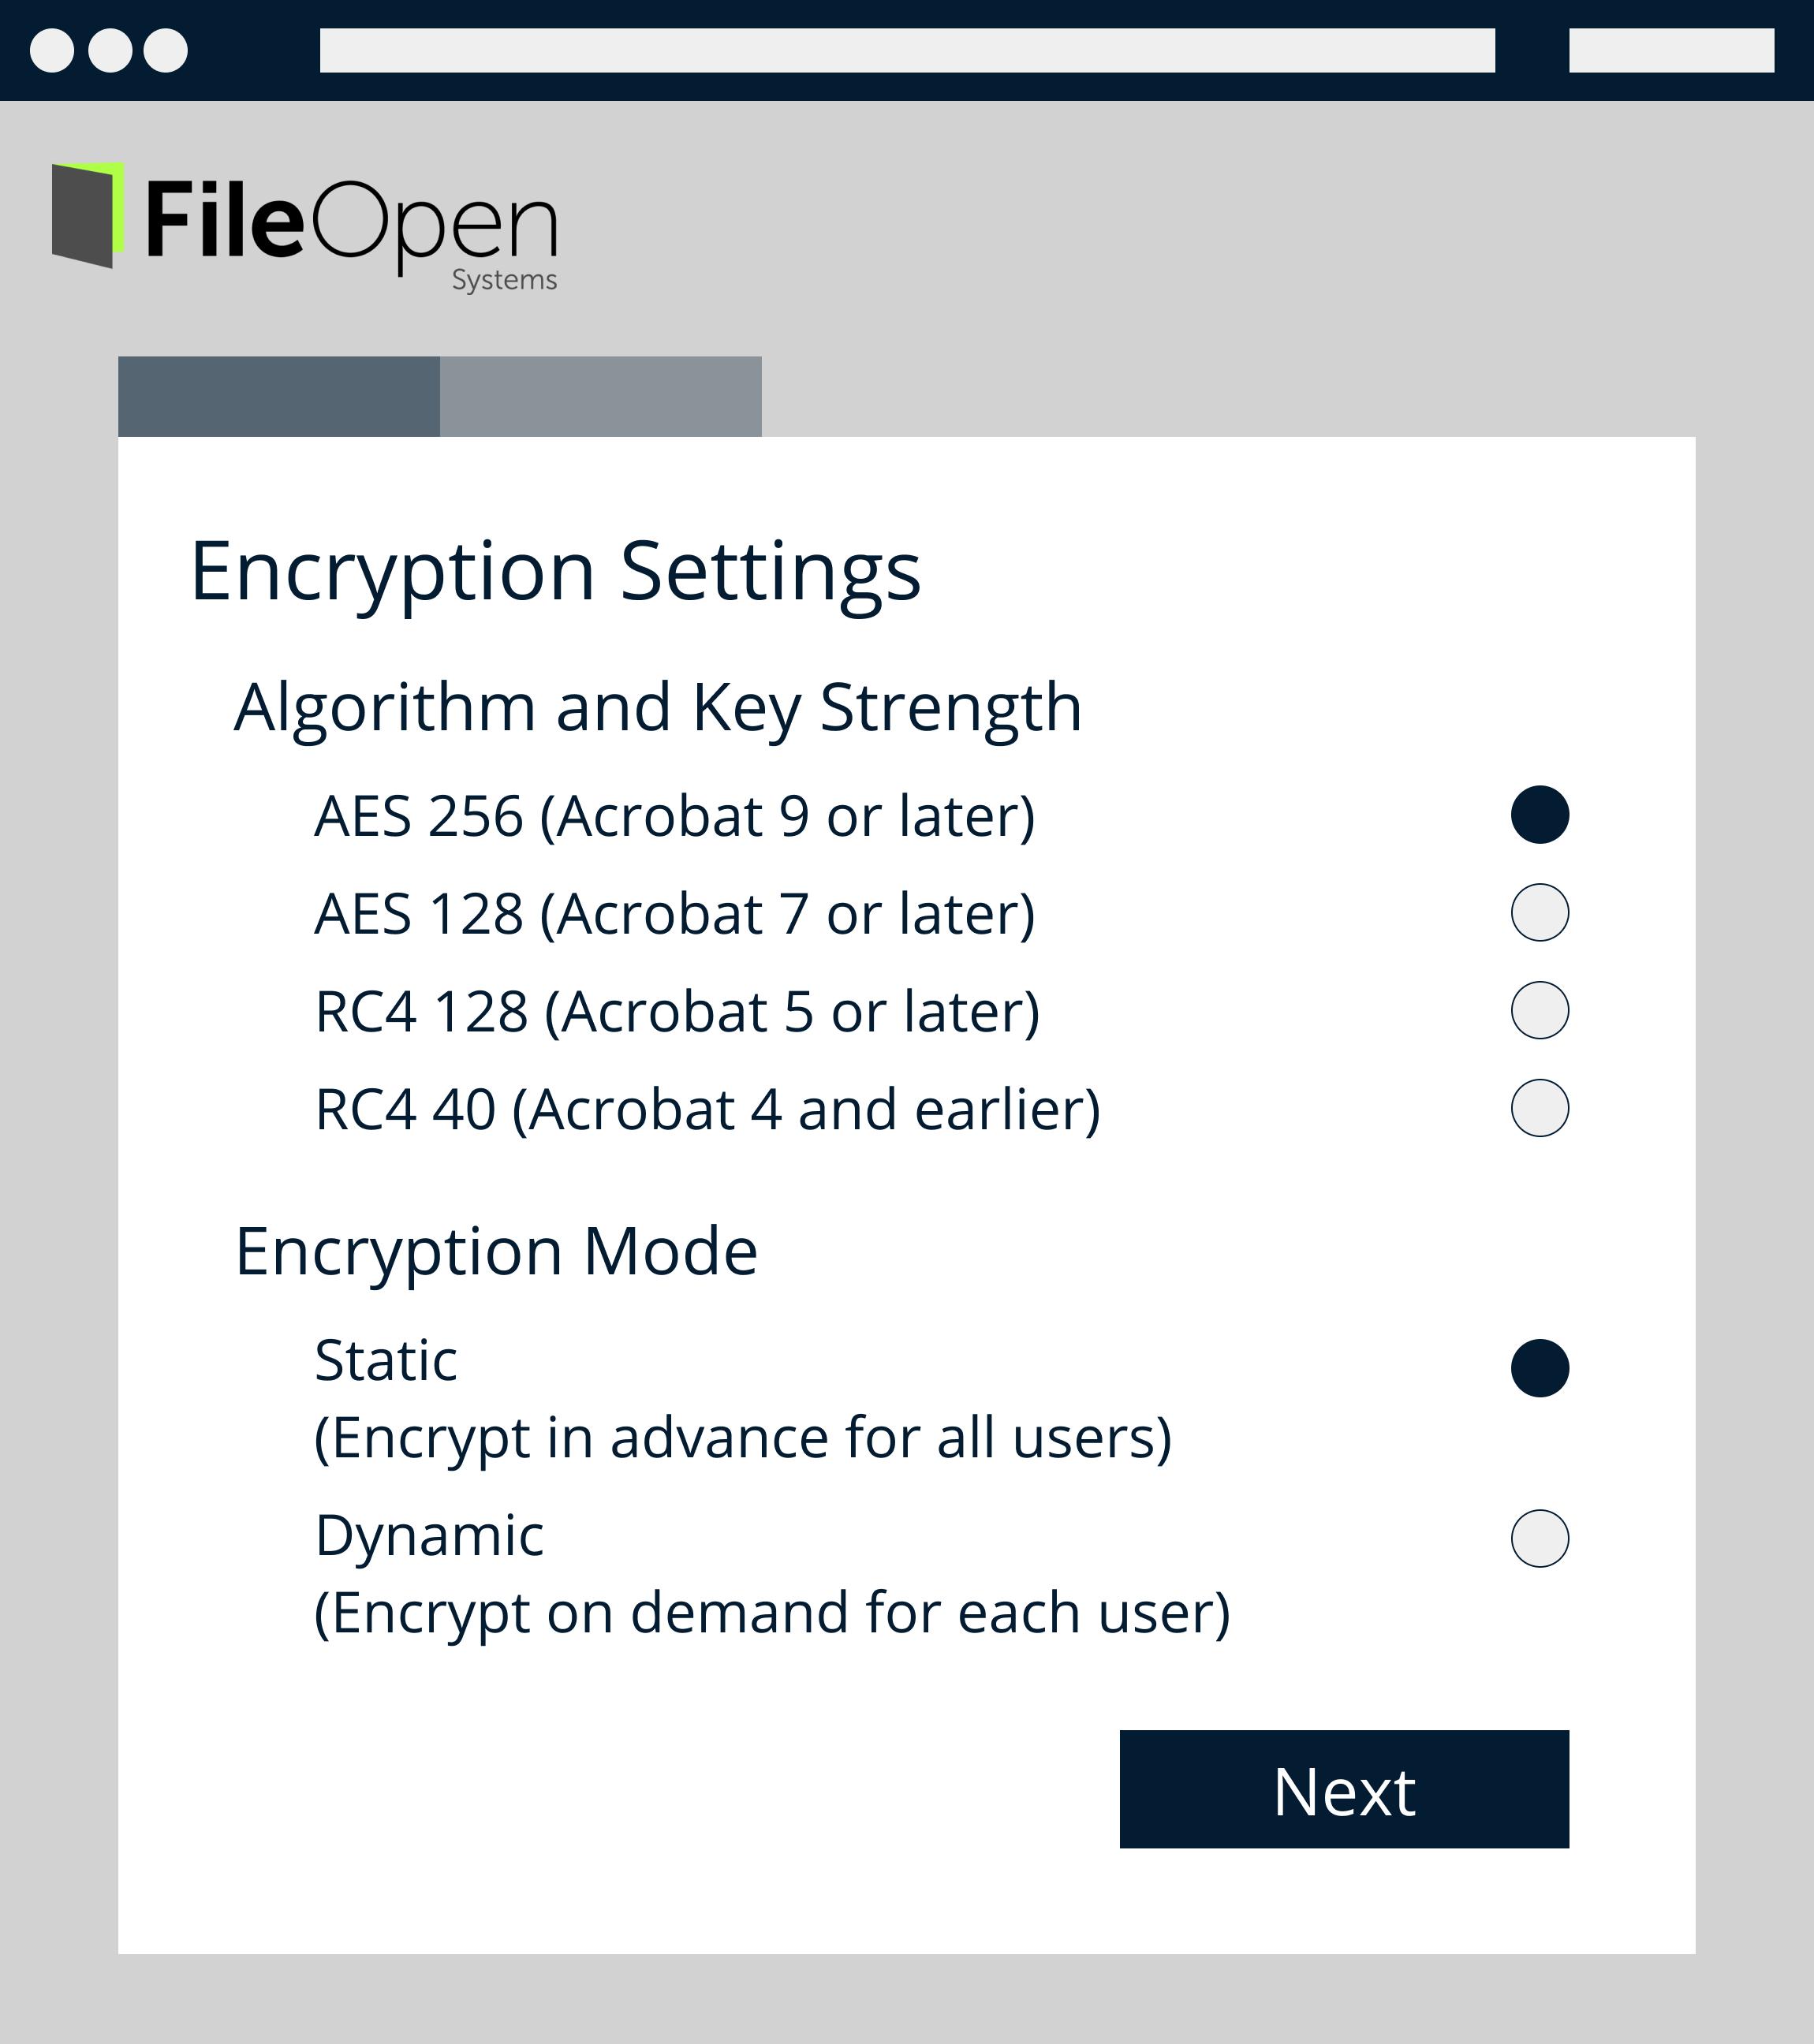 Encryption Settings